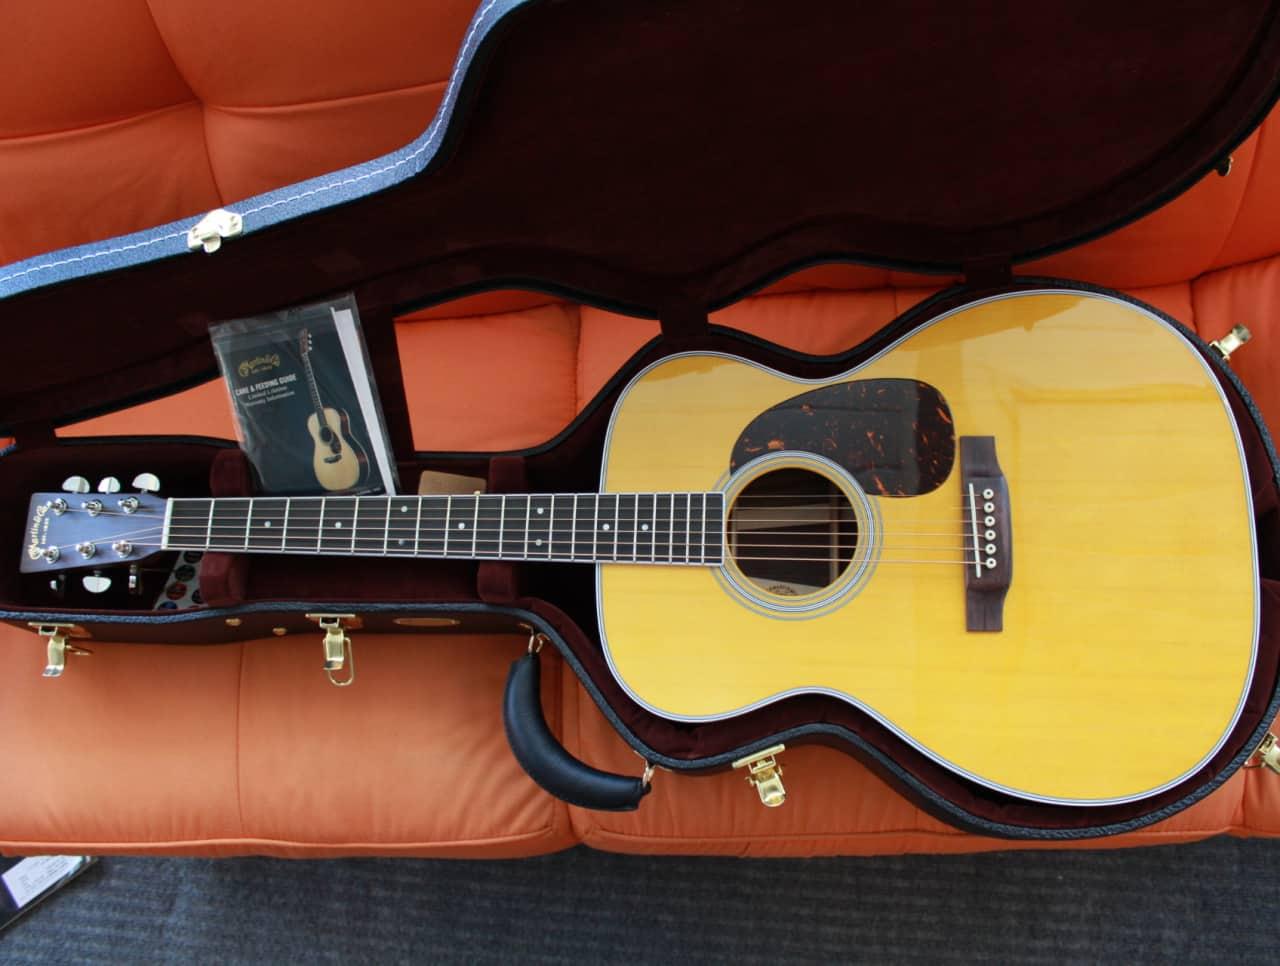 martin m36 2017 acoustic guitar w case new reverb. Black Bedroom Furniture Sets. Home Design Ideas